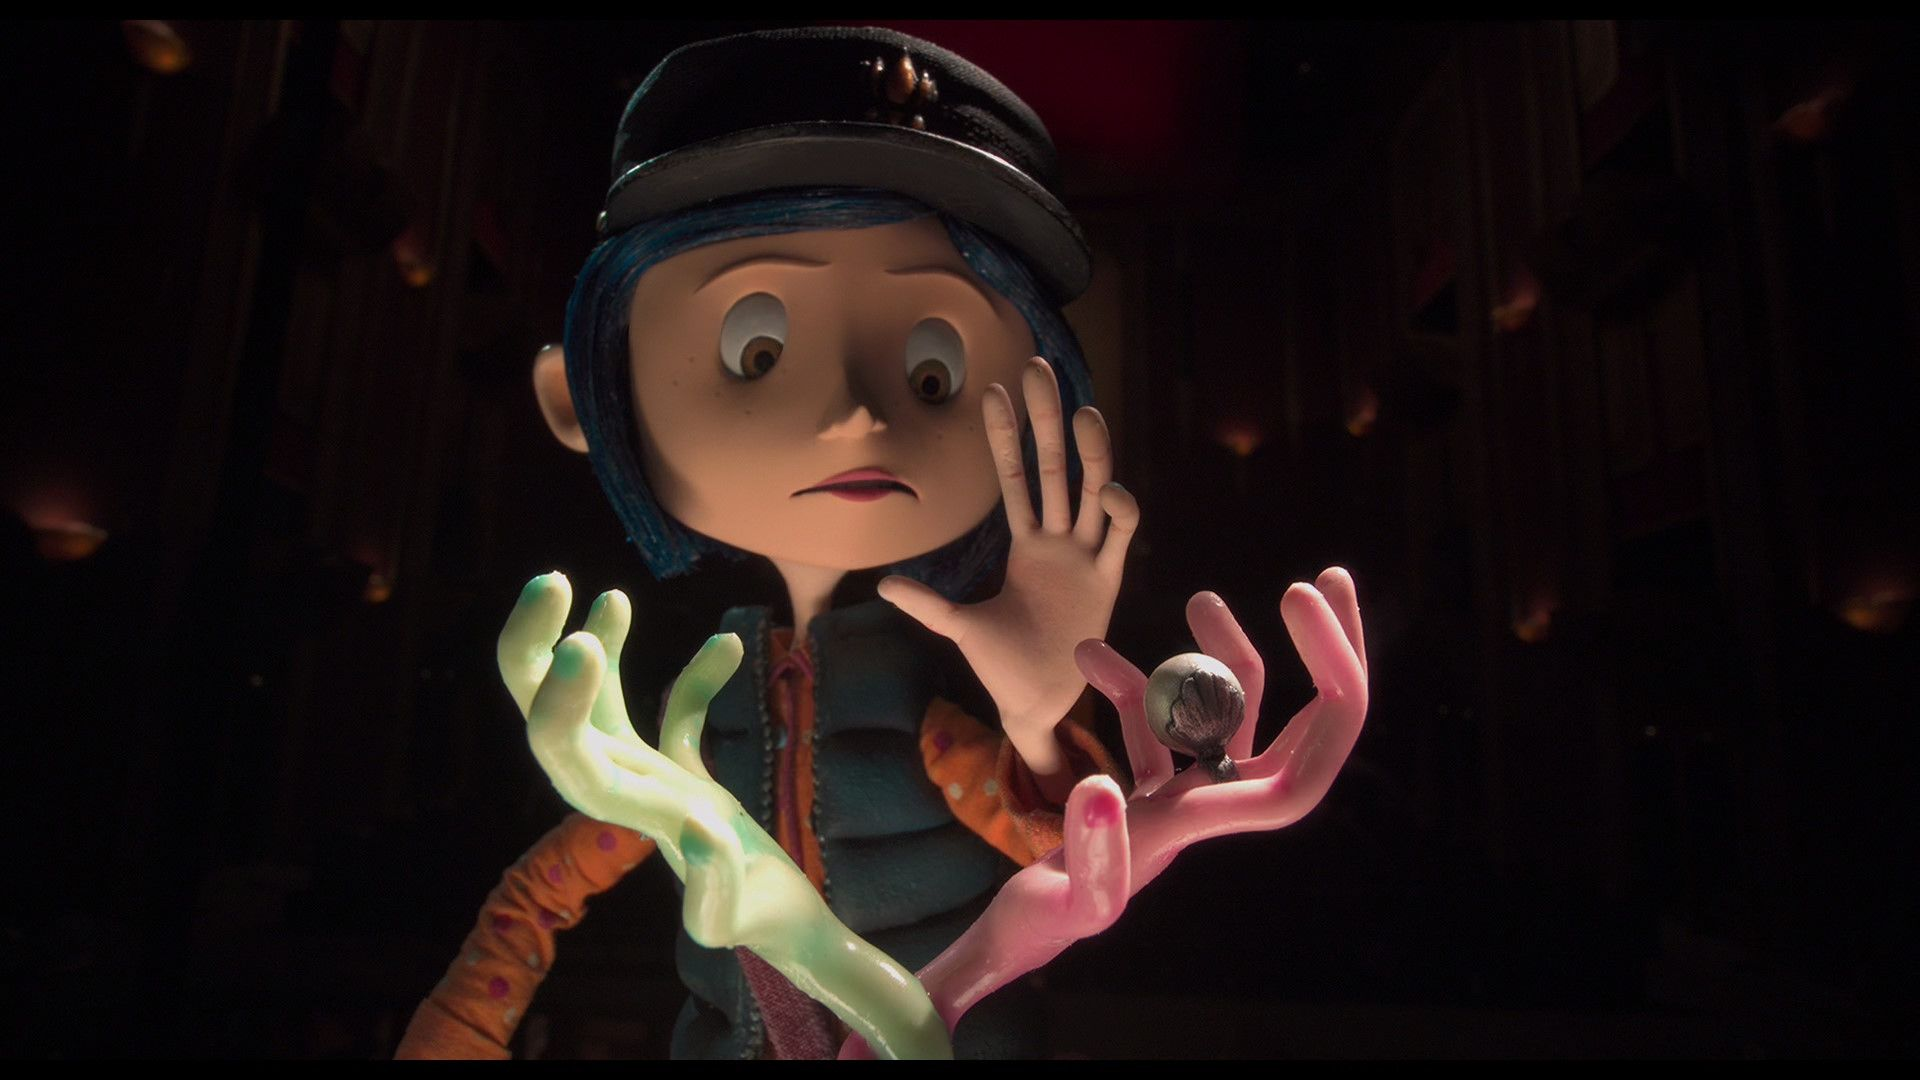 Coraline Blu Ray Teri Hatcher Dakota Fanning Coraline Coraline Aesthetic Stop Motion